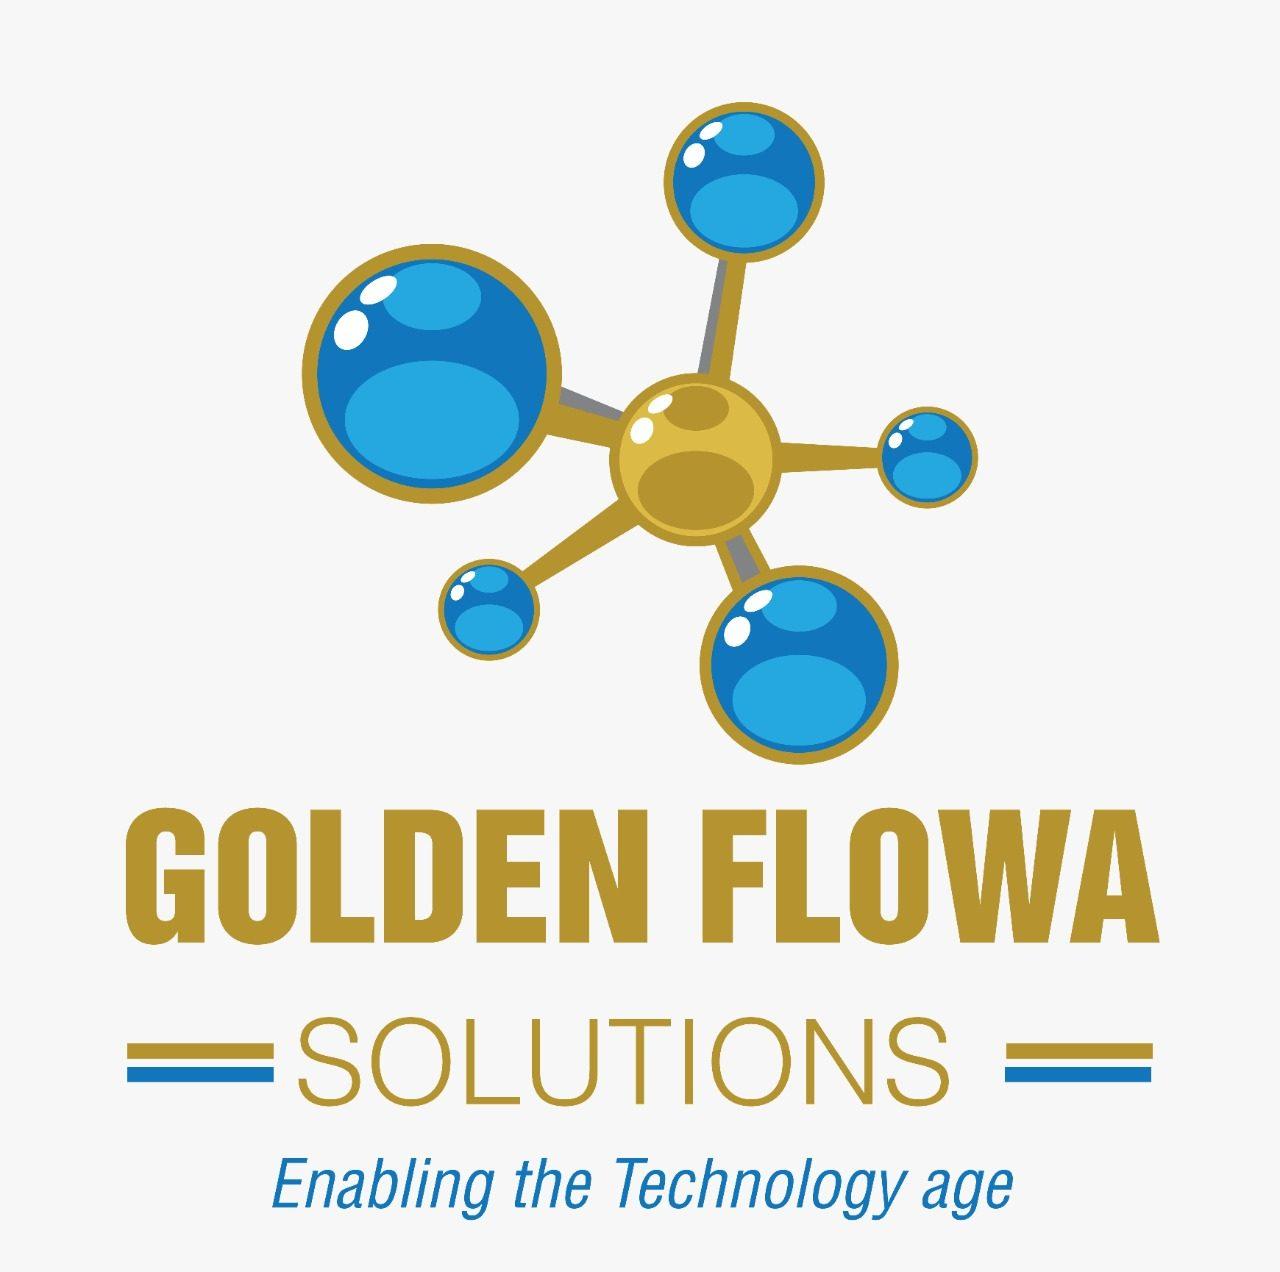 Golden Flowa Solutions